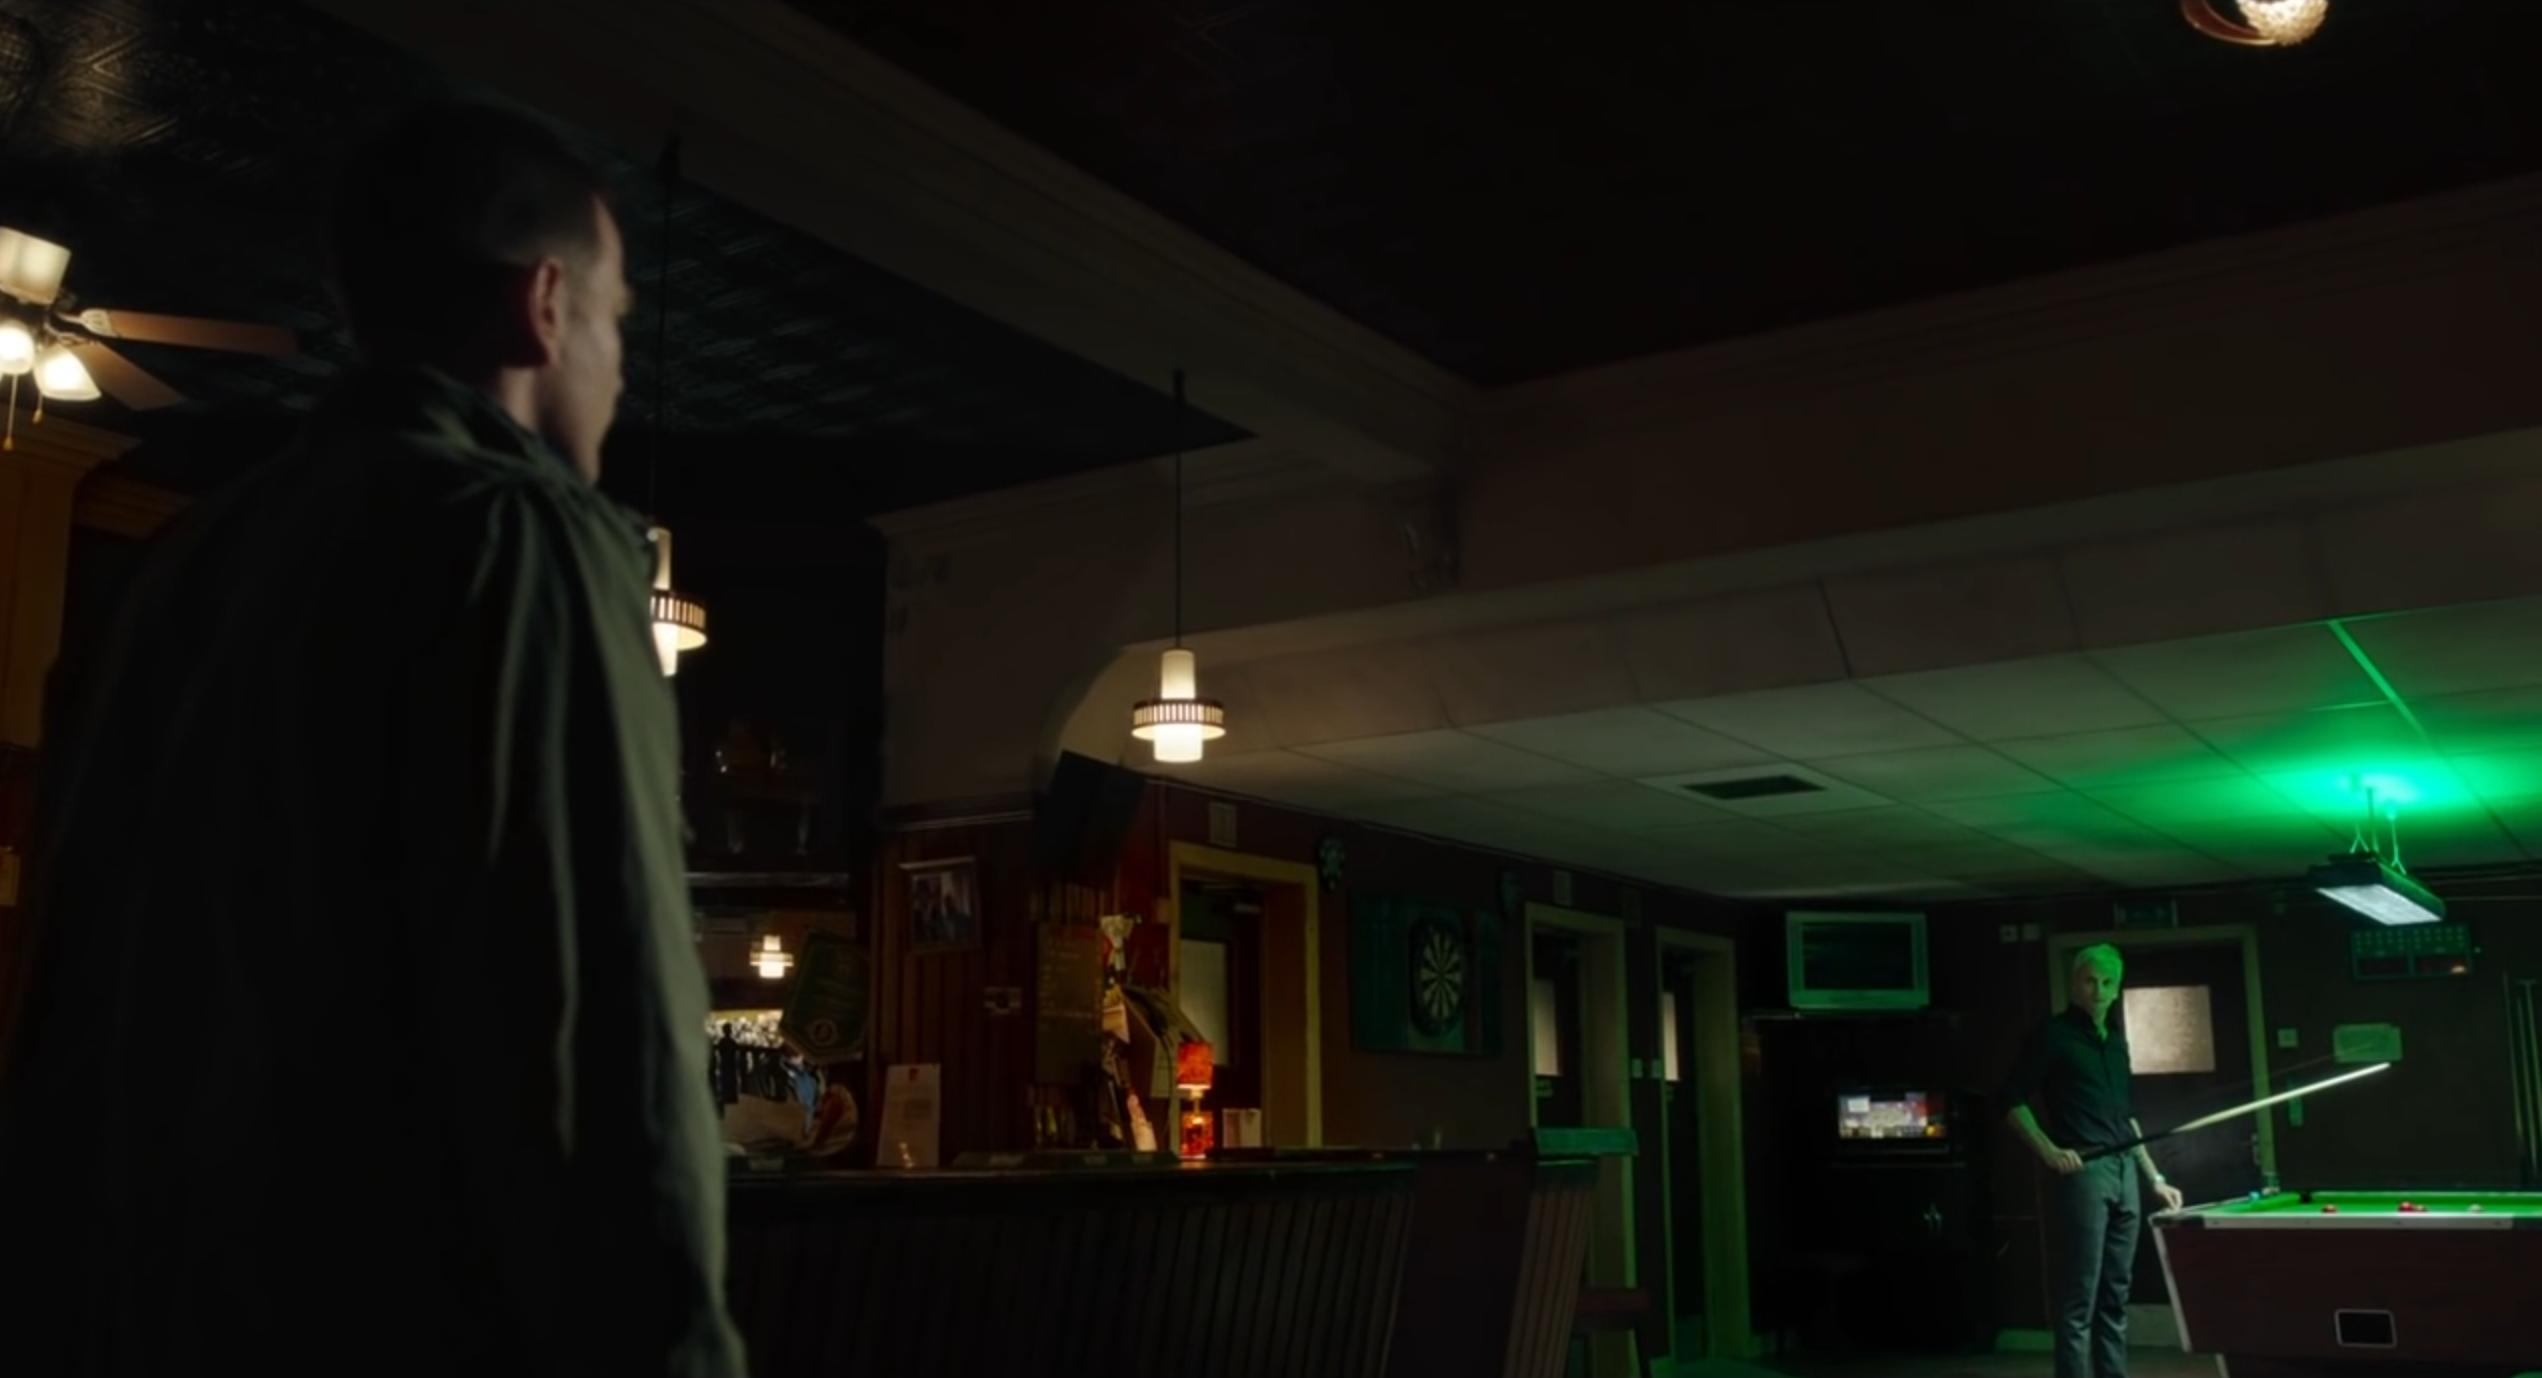 T2: Trainspotting 2 - Ewan McGregor e Jonny Lee Miller in un'immagine del trailer del film